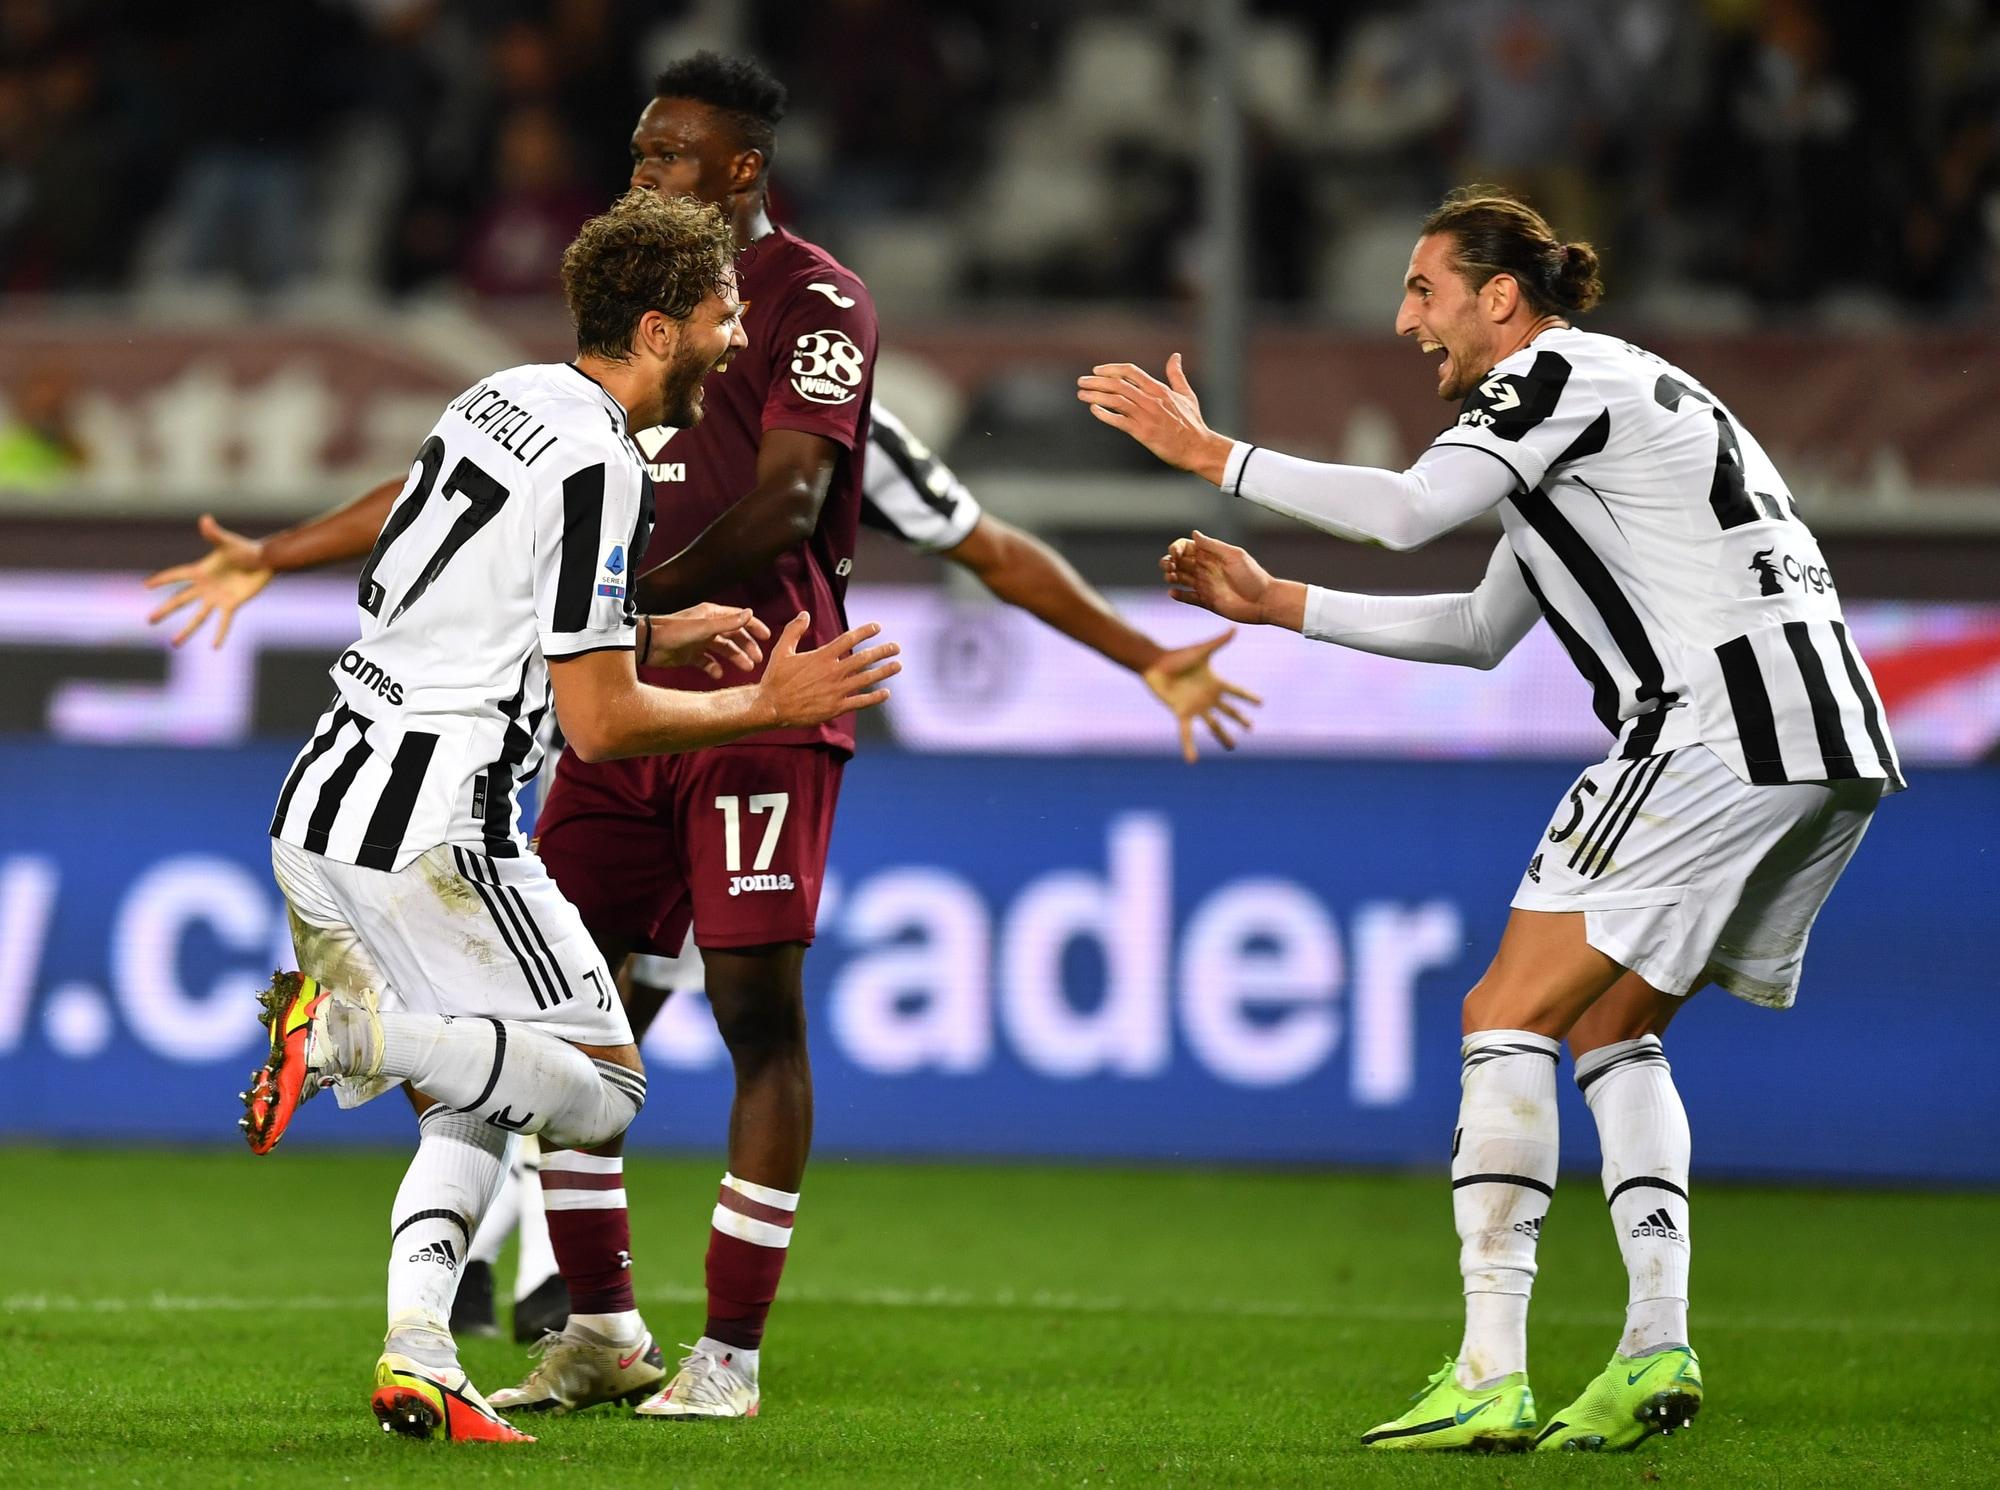 Locatelli wins the Turin derby: Juventus Allegri wins again